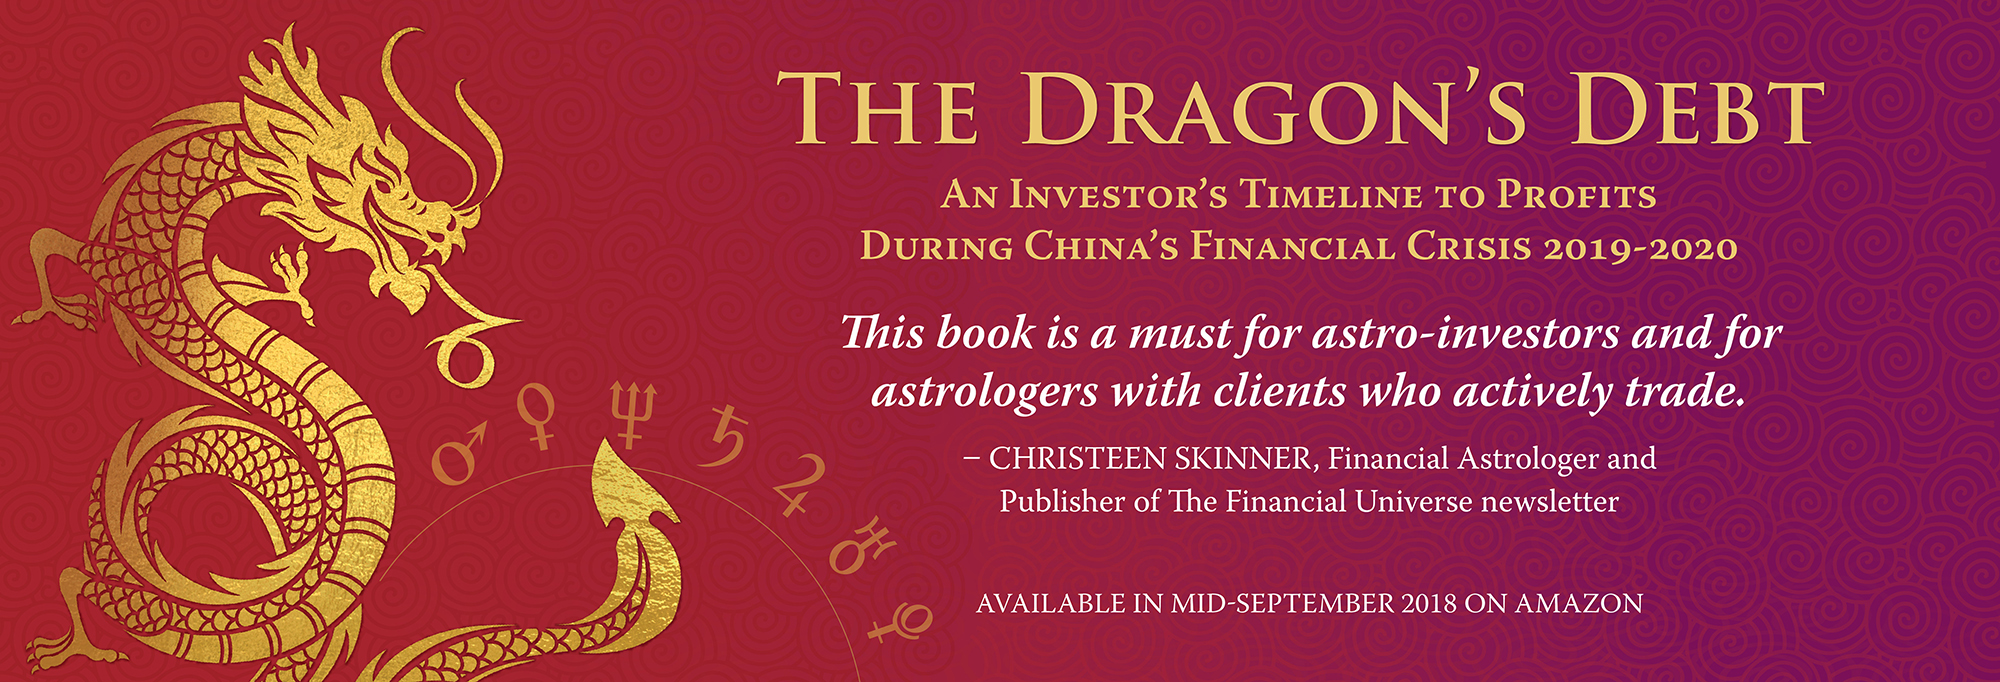 The_Dragons_Debt.jpg